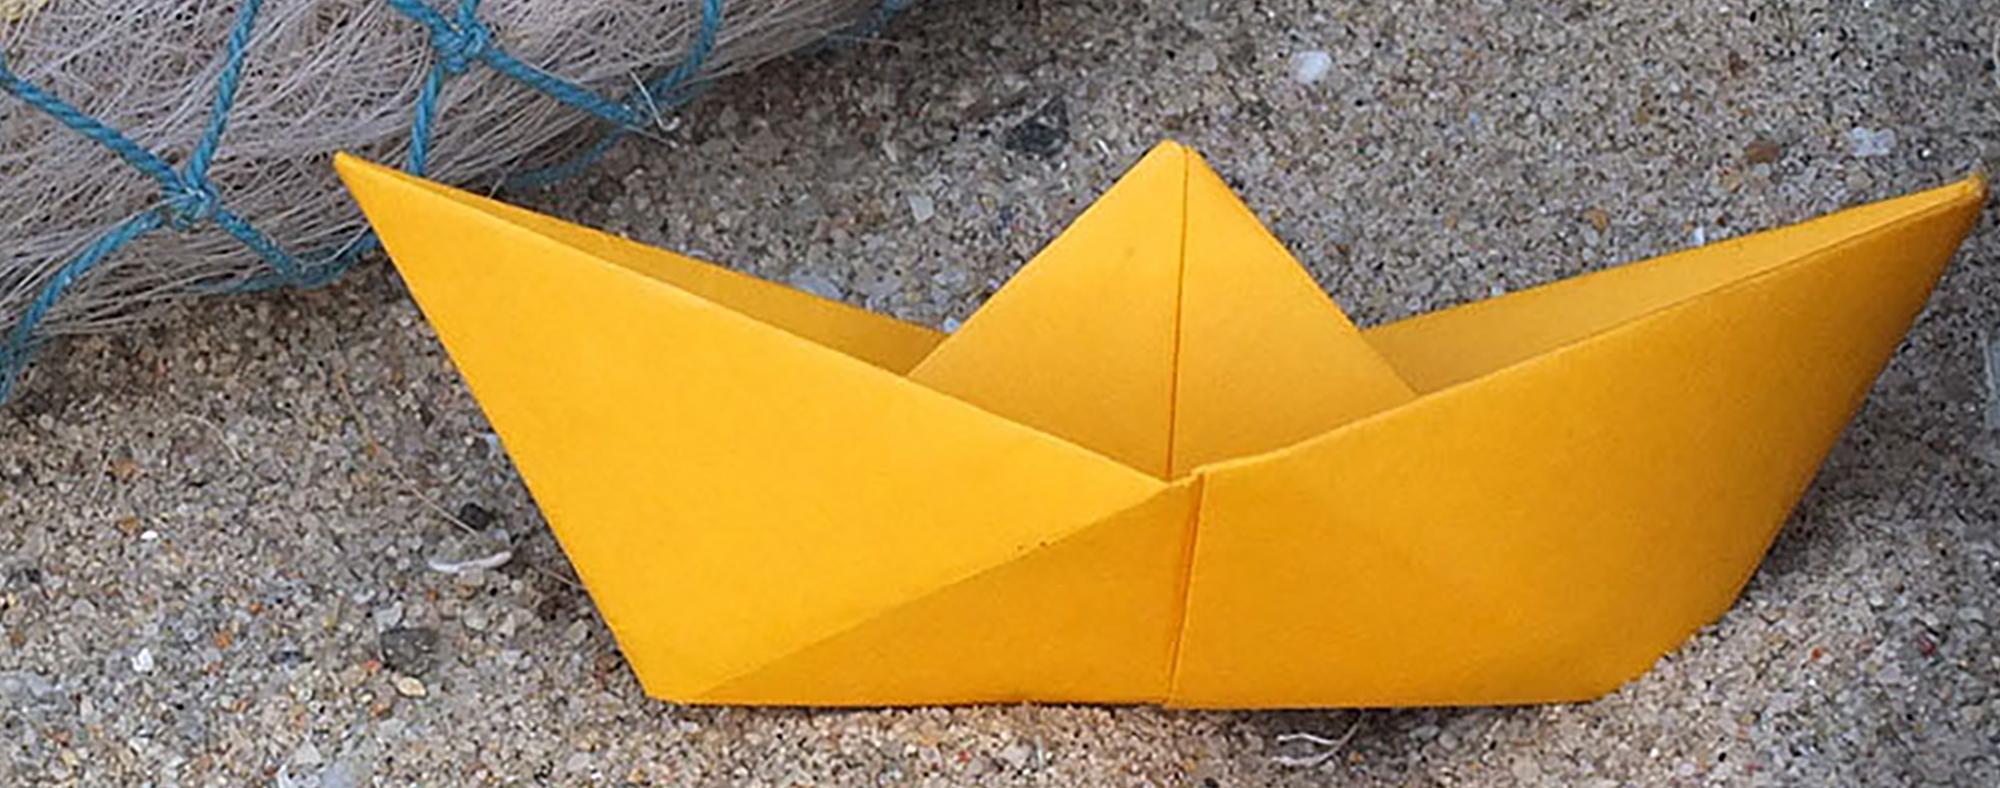 Origami Petit Bateau De Papier - Little Urban avec Origami Petit Bateau